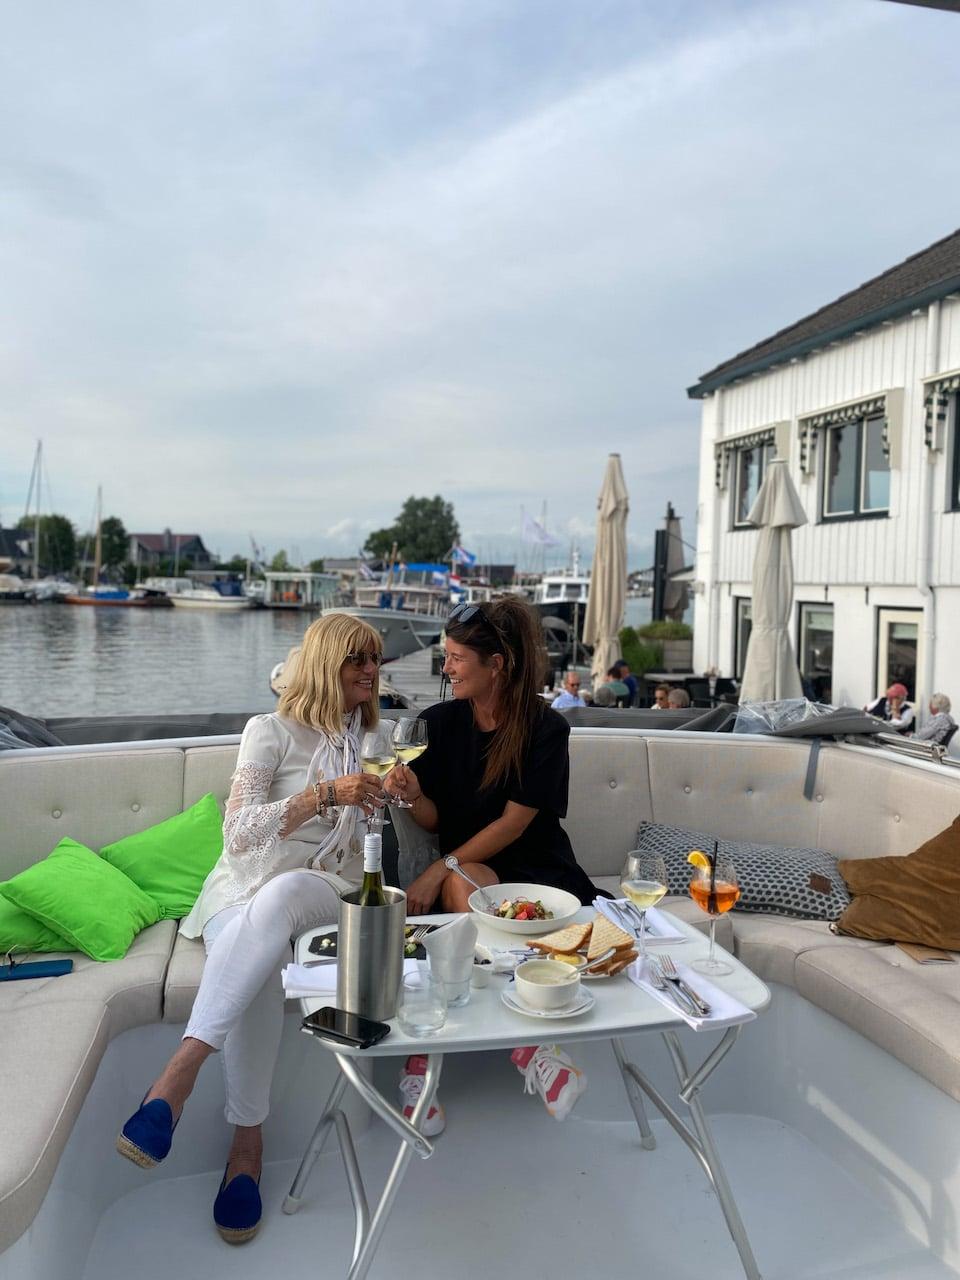 Vaarvakantie in Friesland - vaarroute voor 1 week  - beste restaurant in Grou hotel Oostergoo